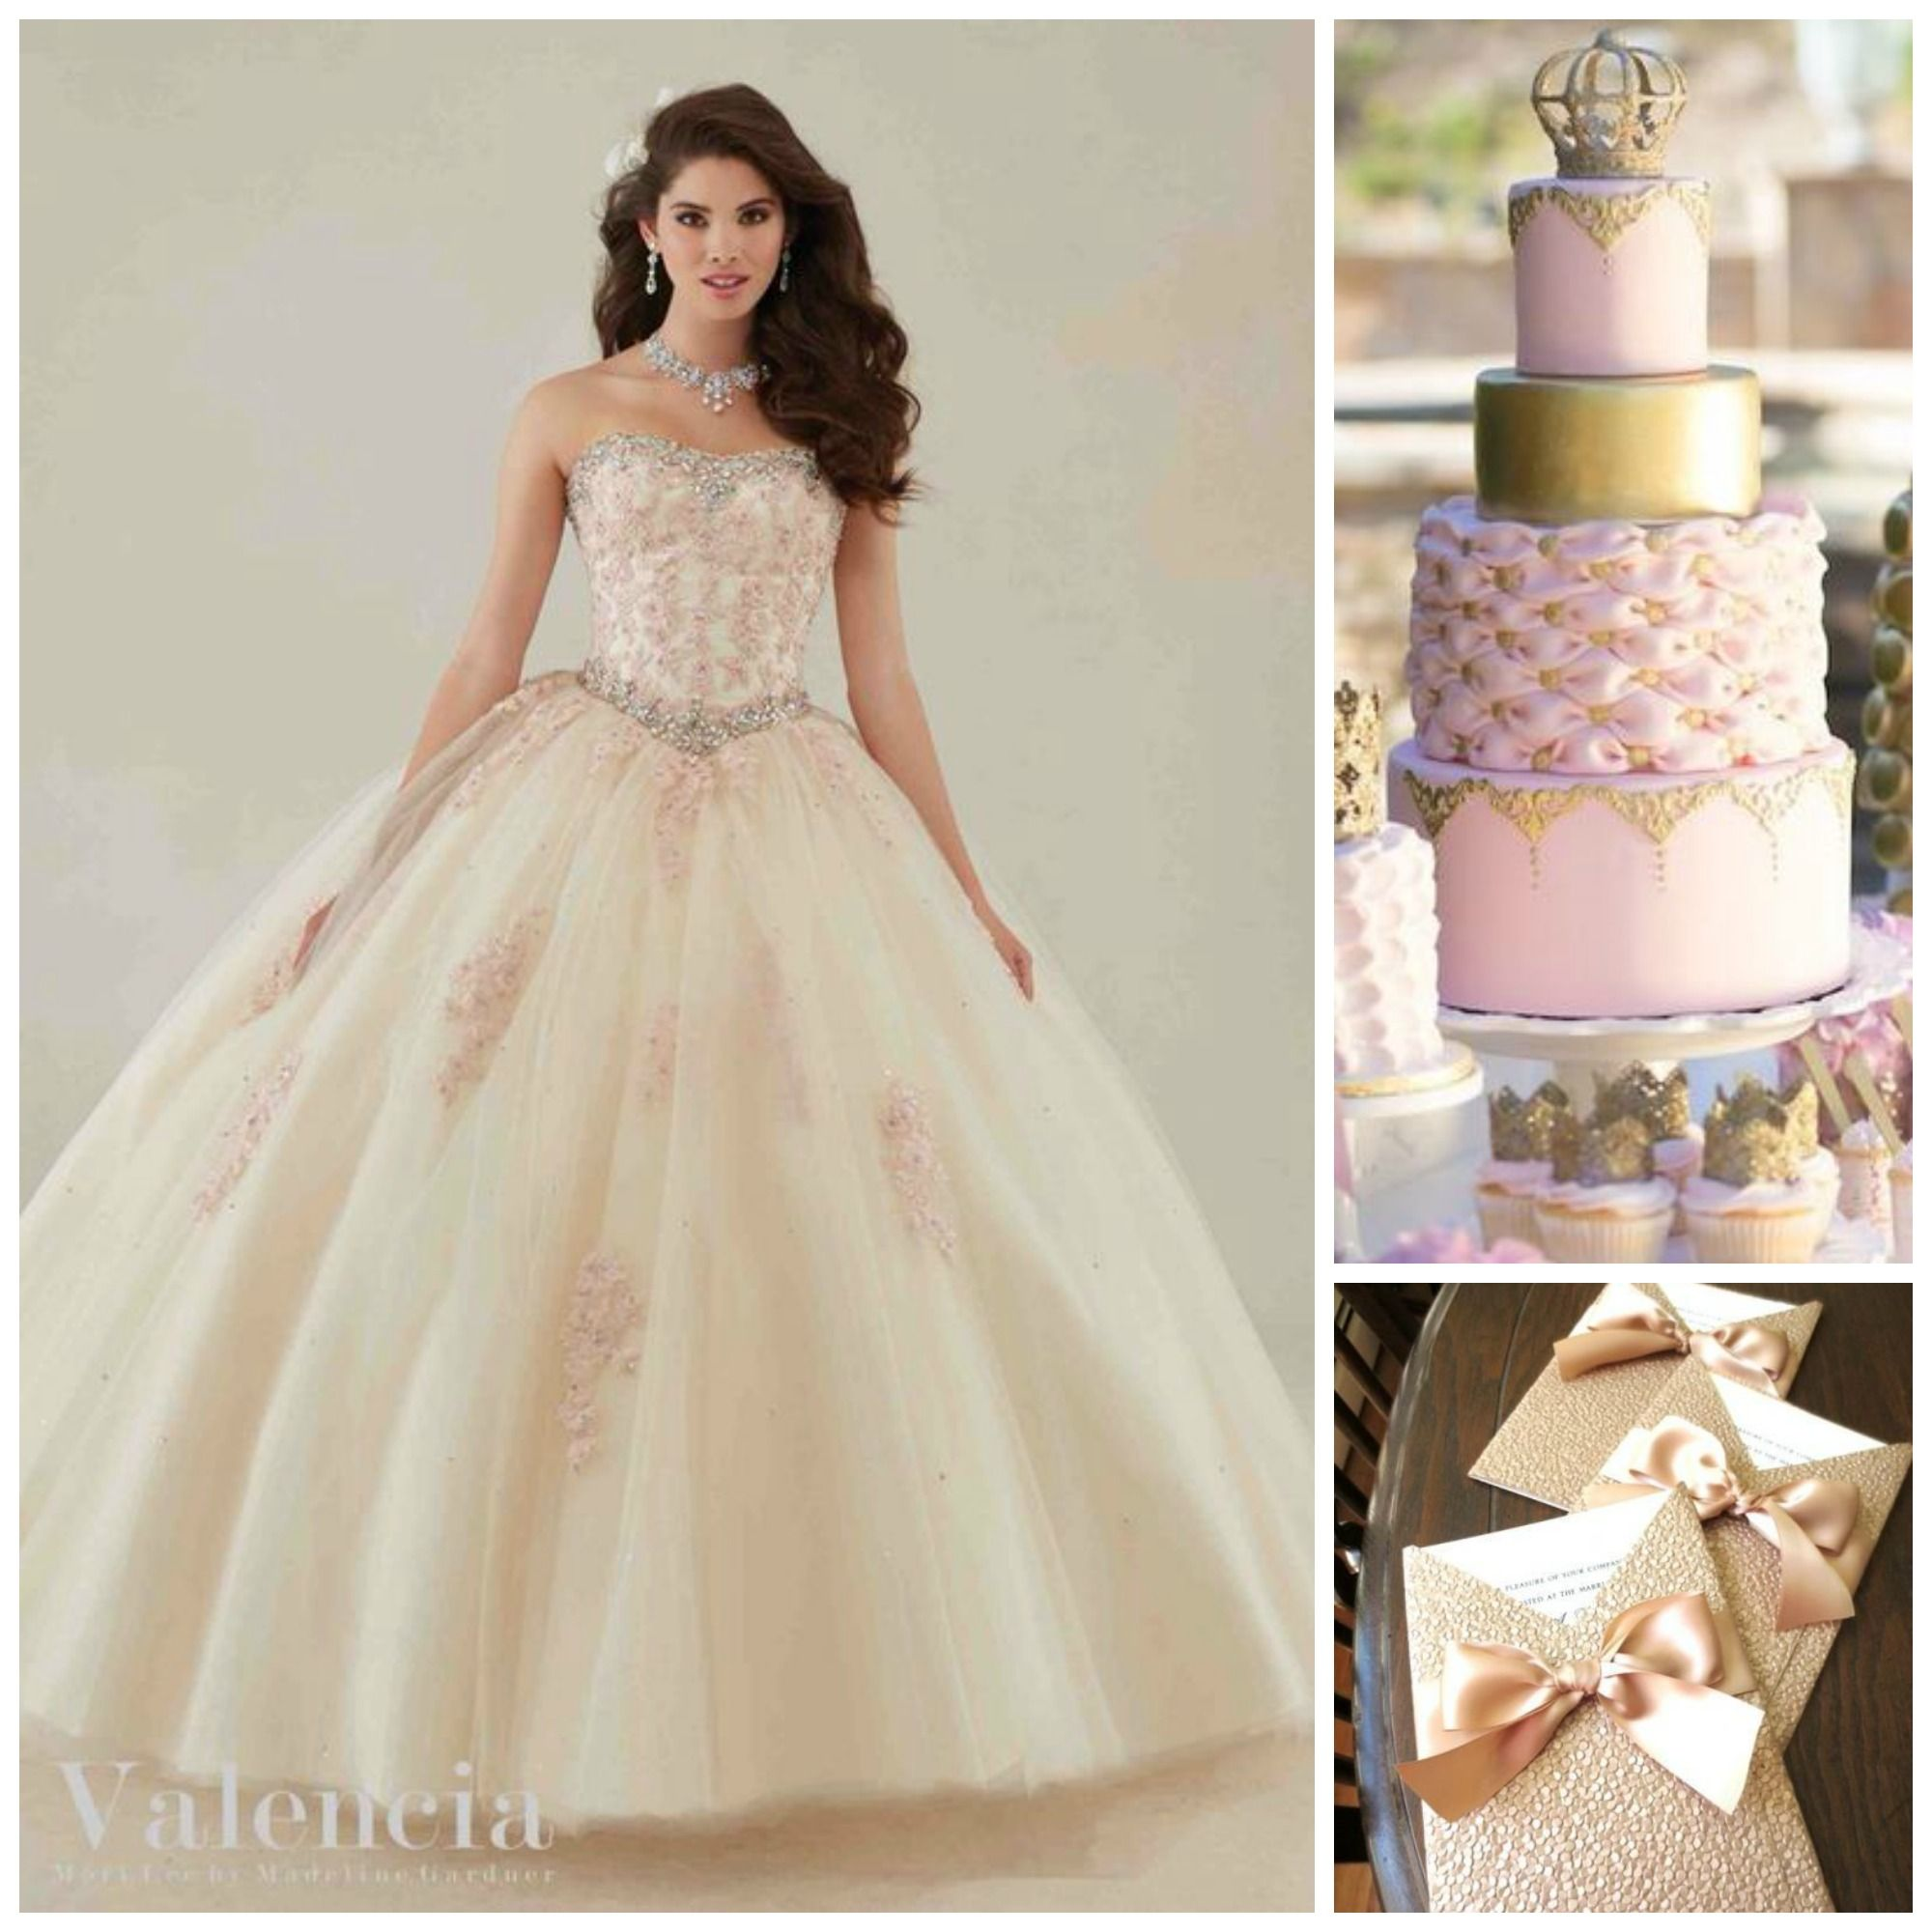 Quince Theme Decorations | Quinceanera ideas, Theme ideas ...